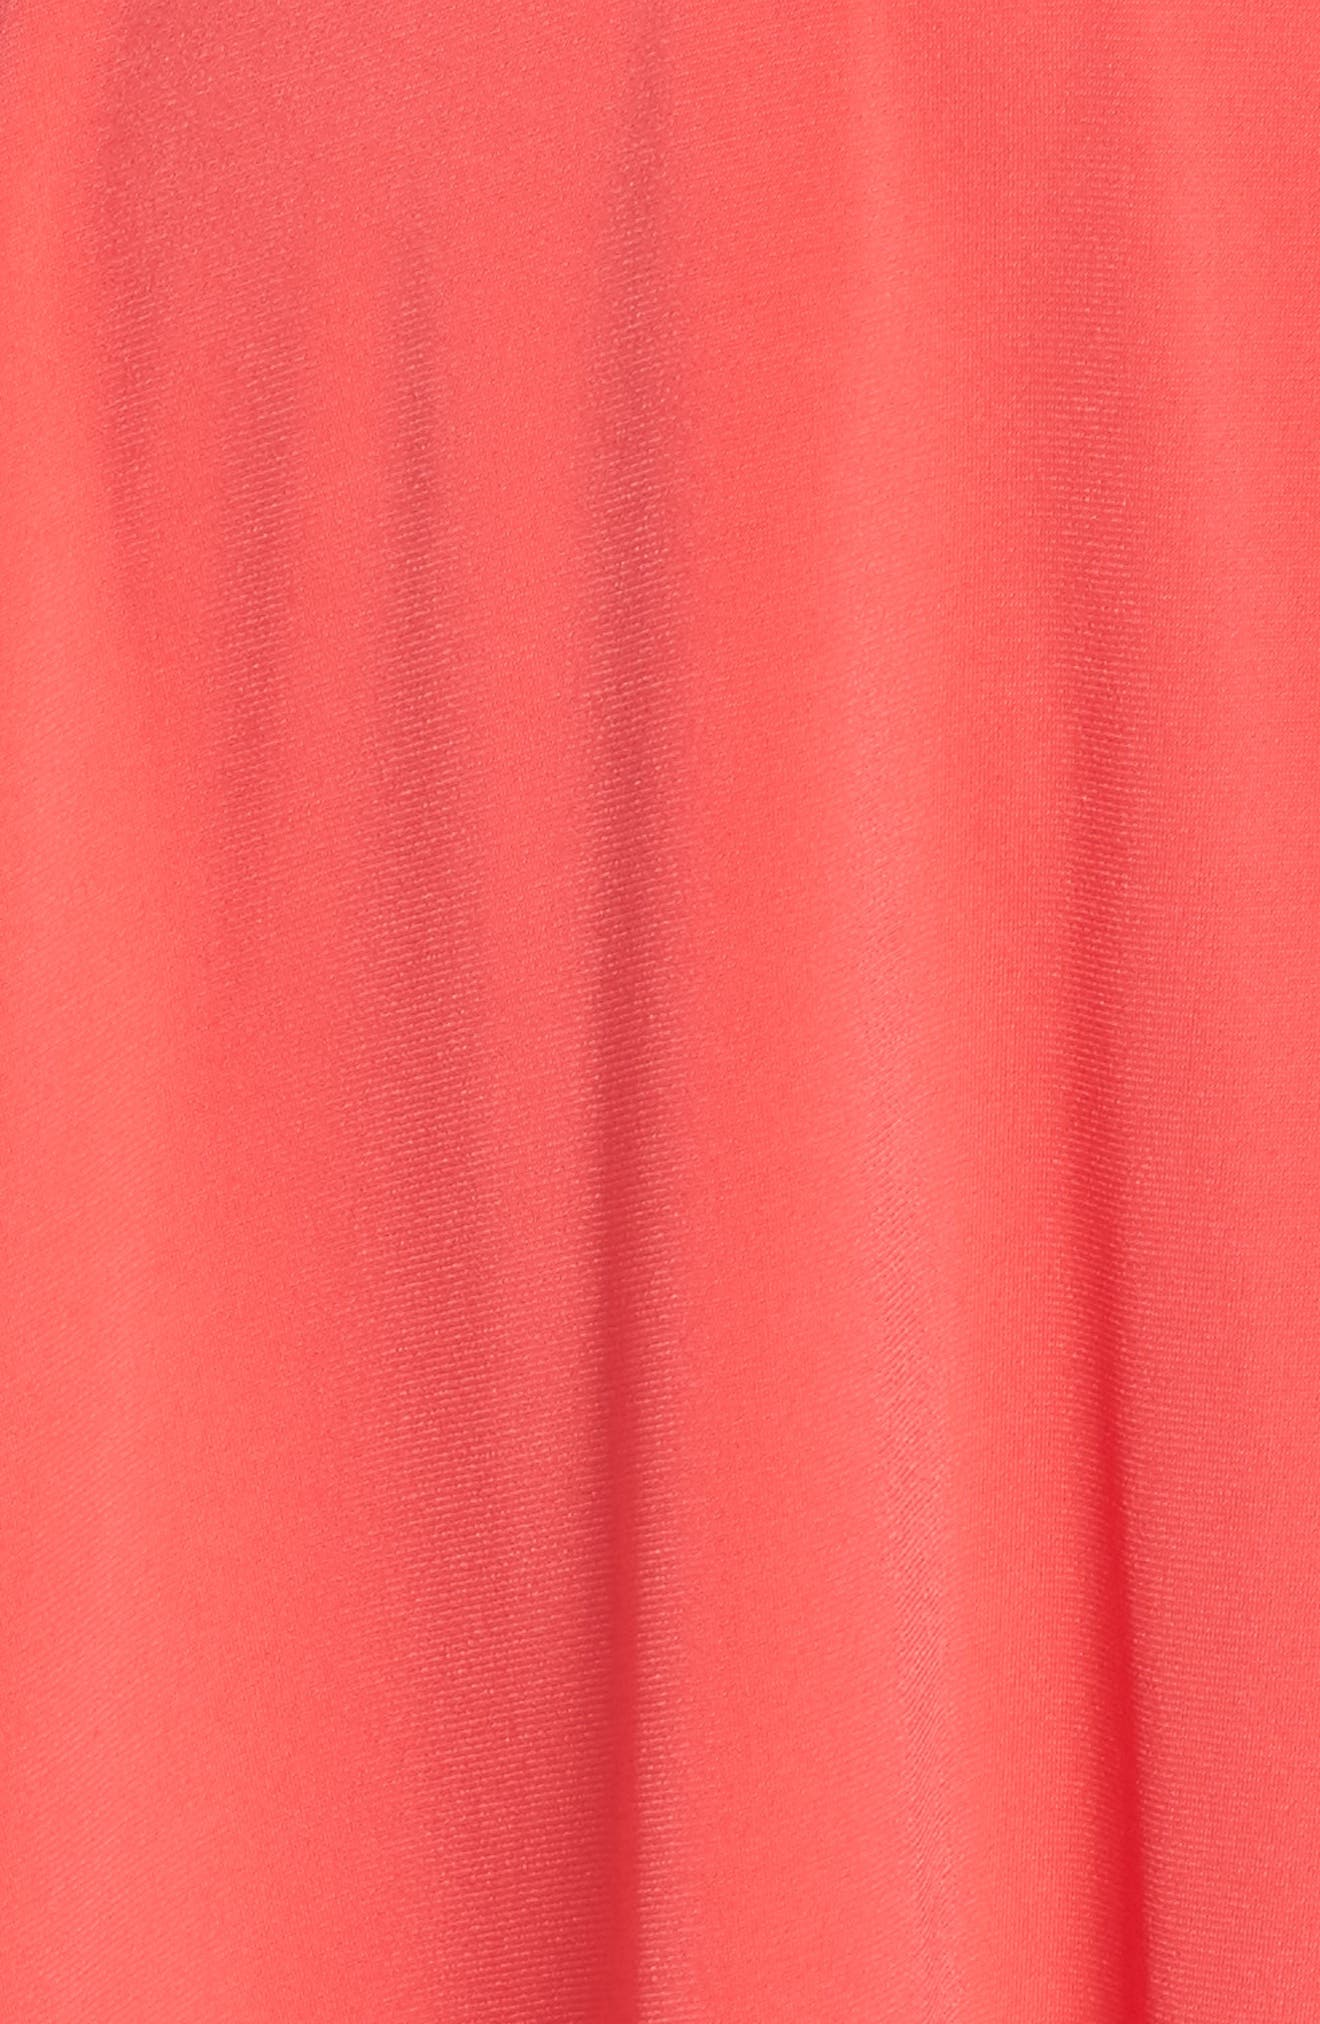 Split Shoulder High/Low Knit Dress,                             Alternate thumbnail 5, color,                             660